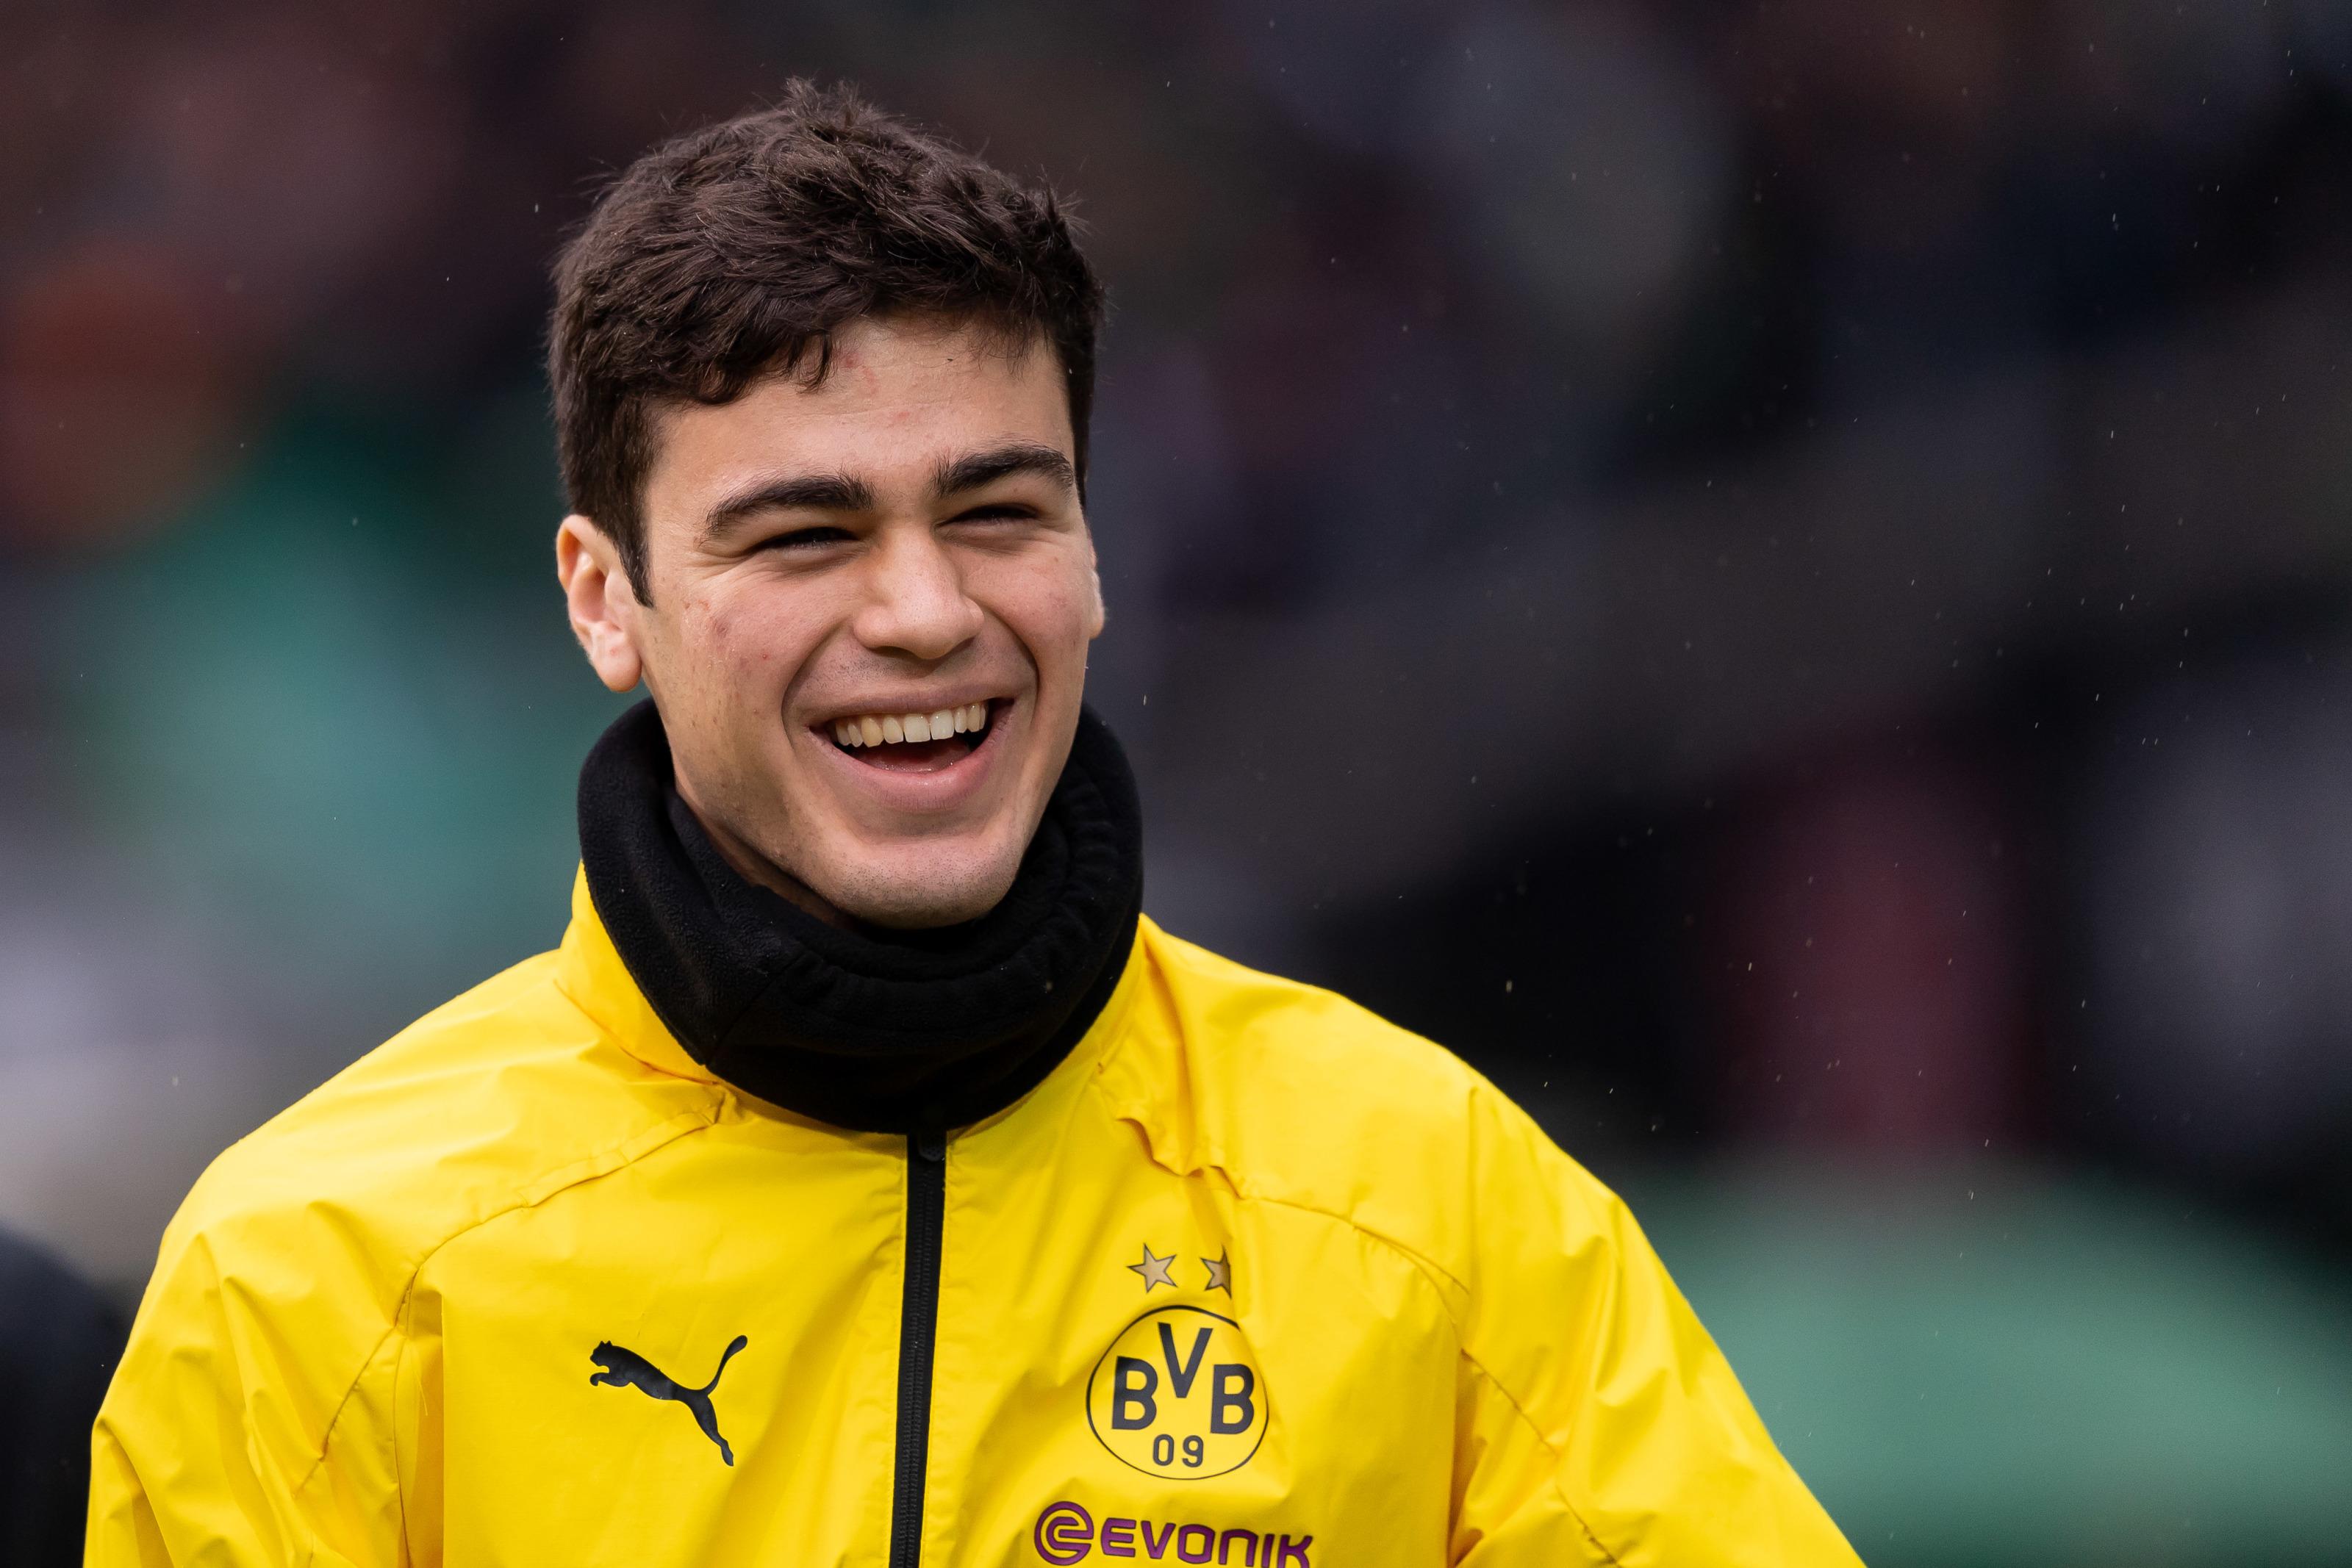 Borussia Dortmund: England tracking Gio Reyna progress